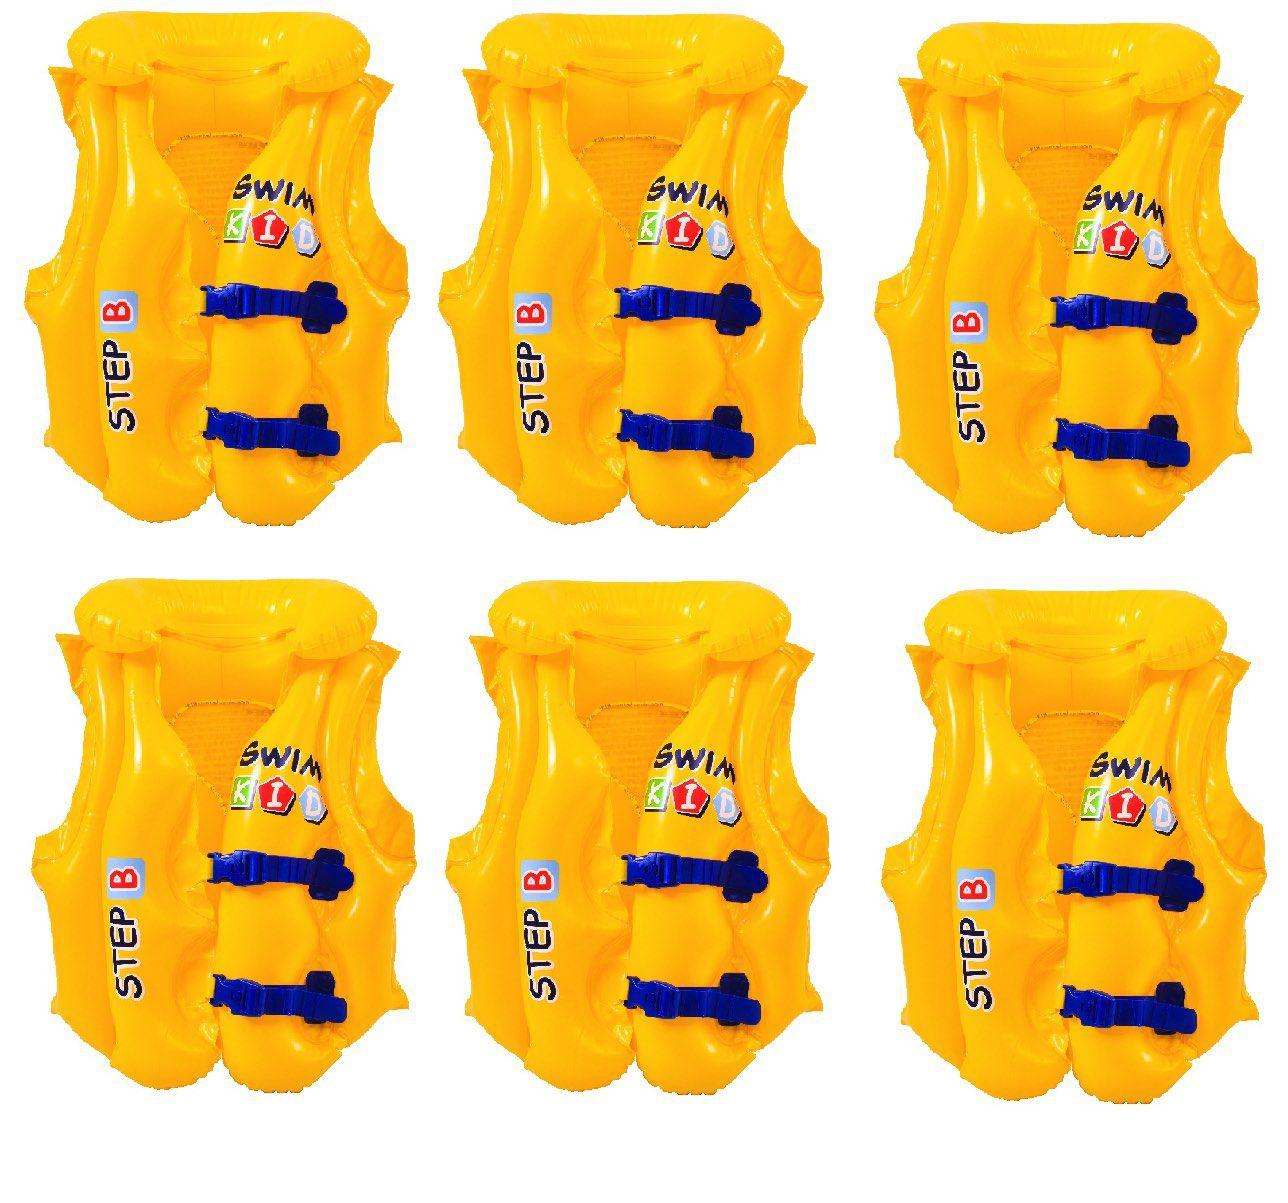 6 UN Colete Inflável Top Swin 30 Kg Apoio Cabeça 2 Camaras